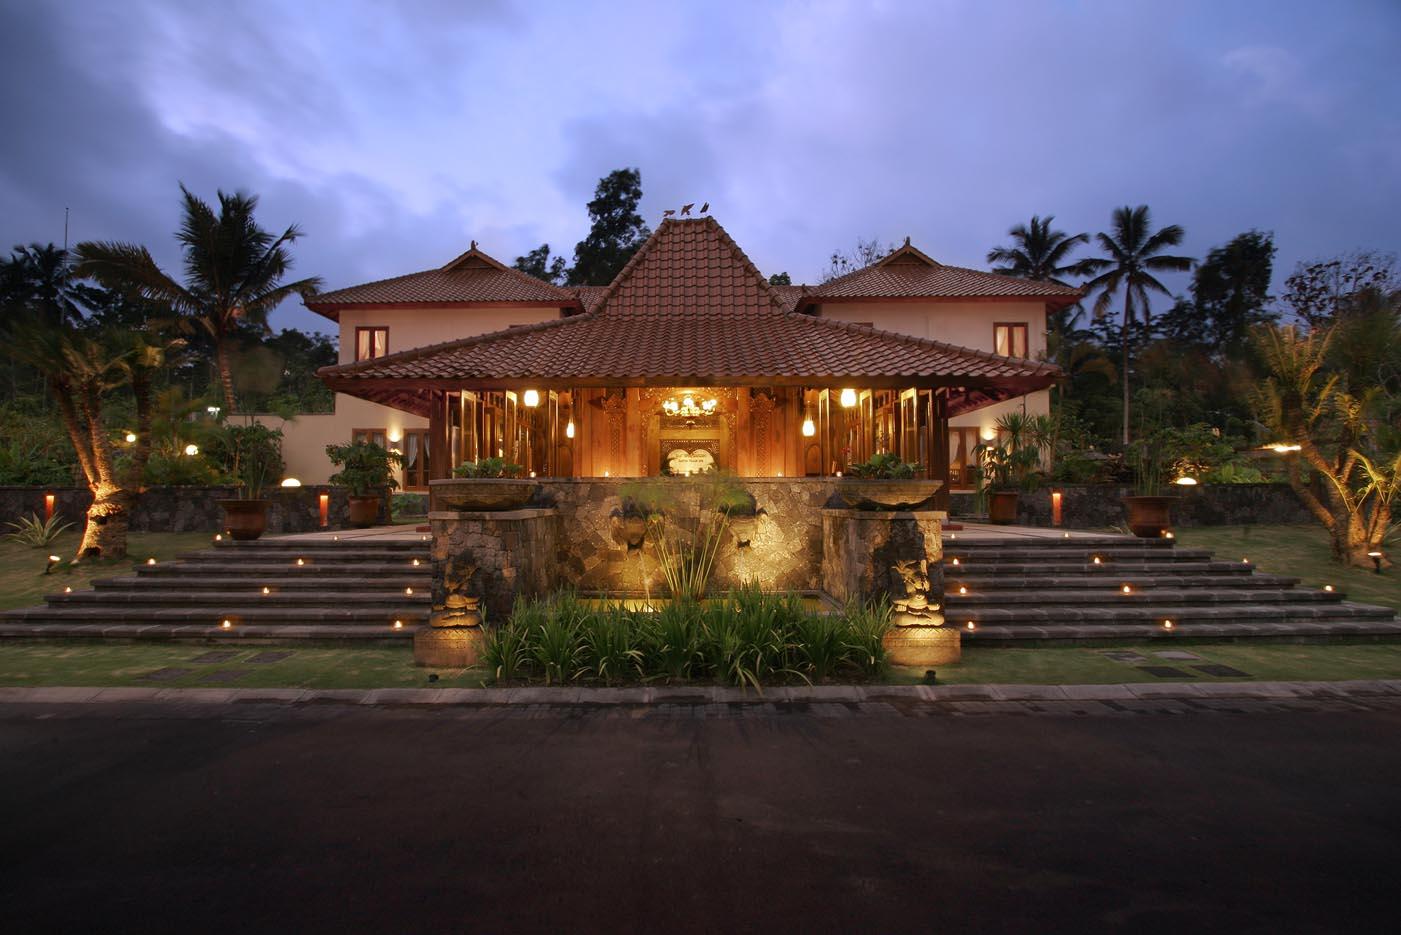 Octagonal Houses Budaya Indonesia Rumah Adat Joglo